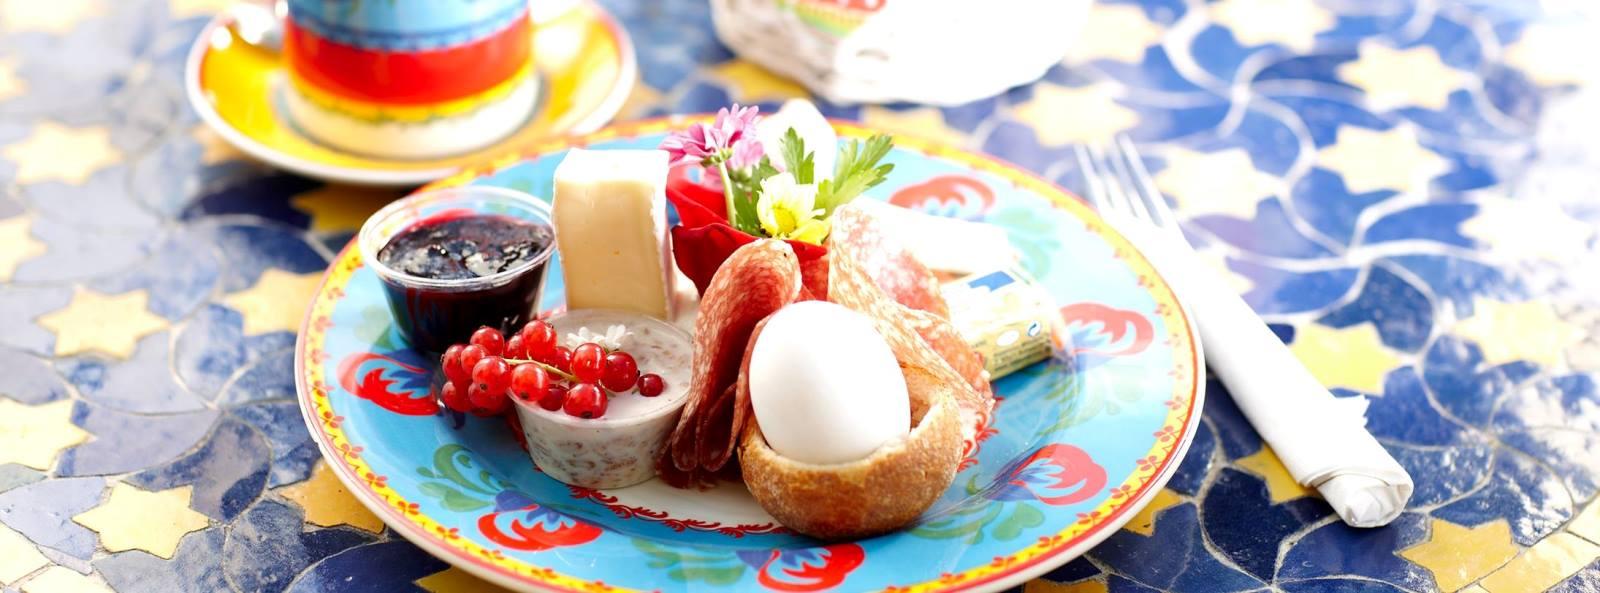 Frühstück im Backspielhaus